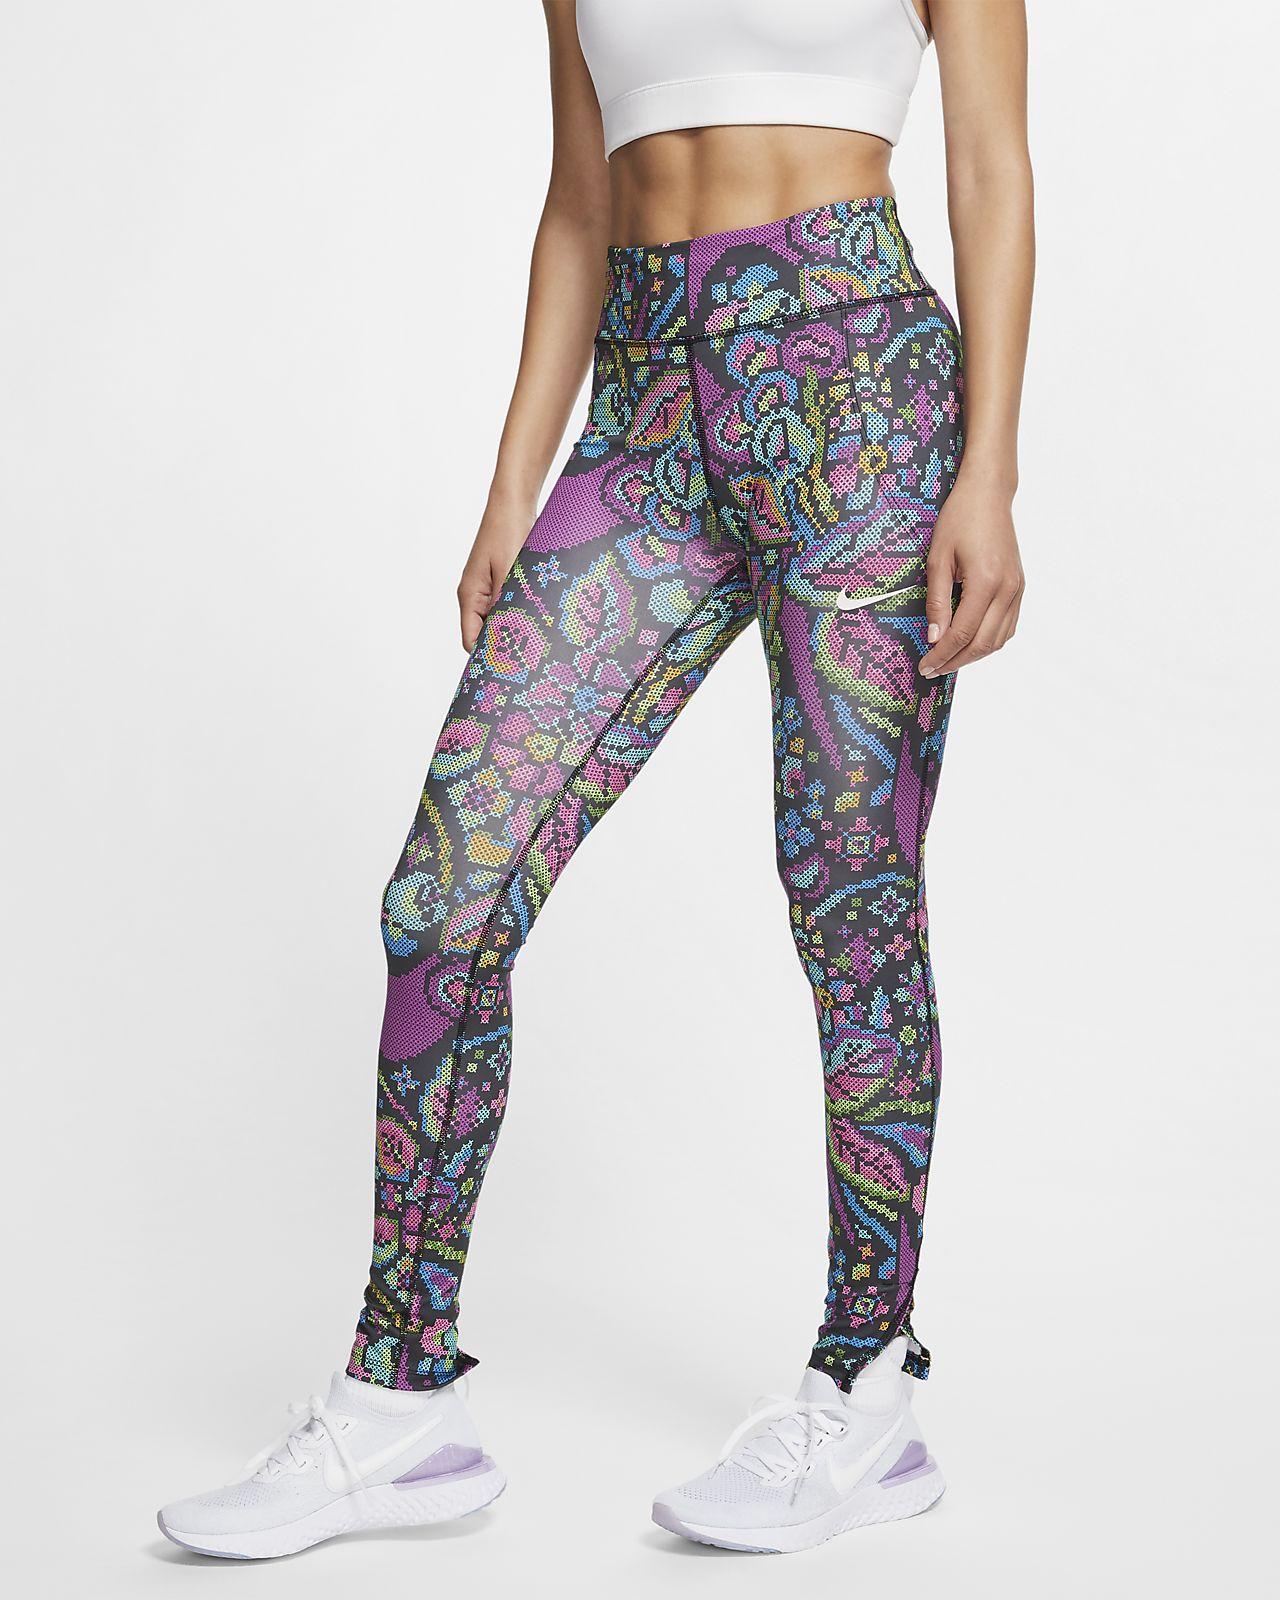 Legging de running imprimé Nike Fast pour Femme